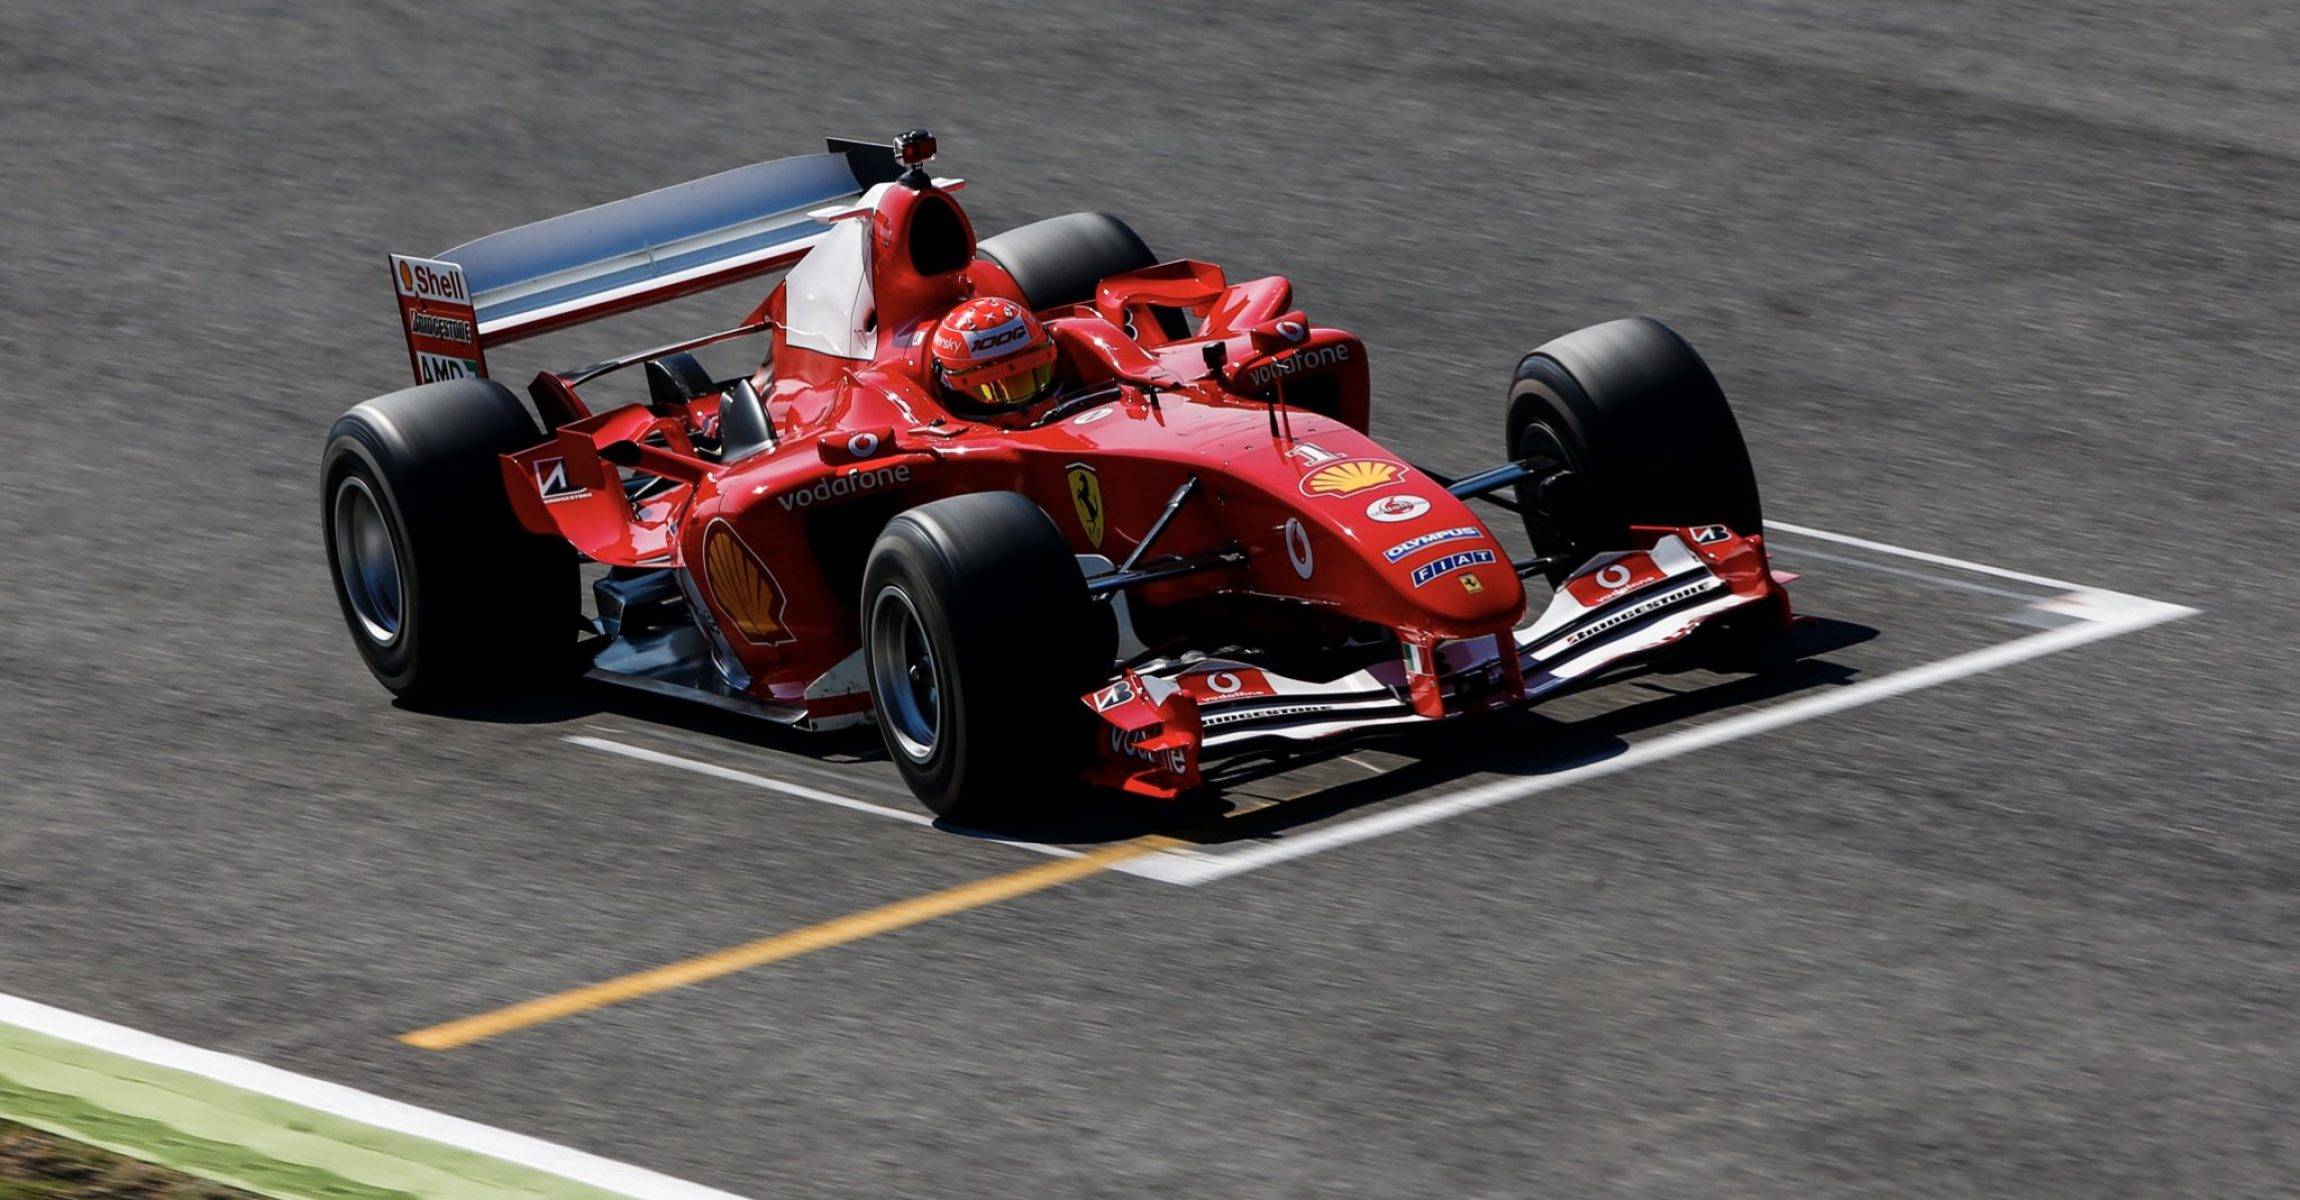 Mick Schumacher, Ferrari, F2004